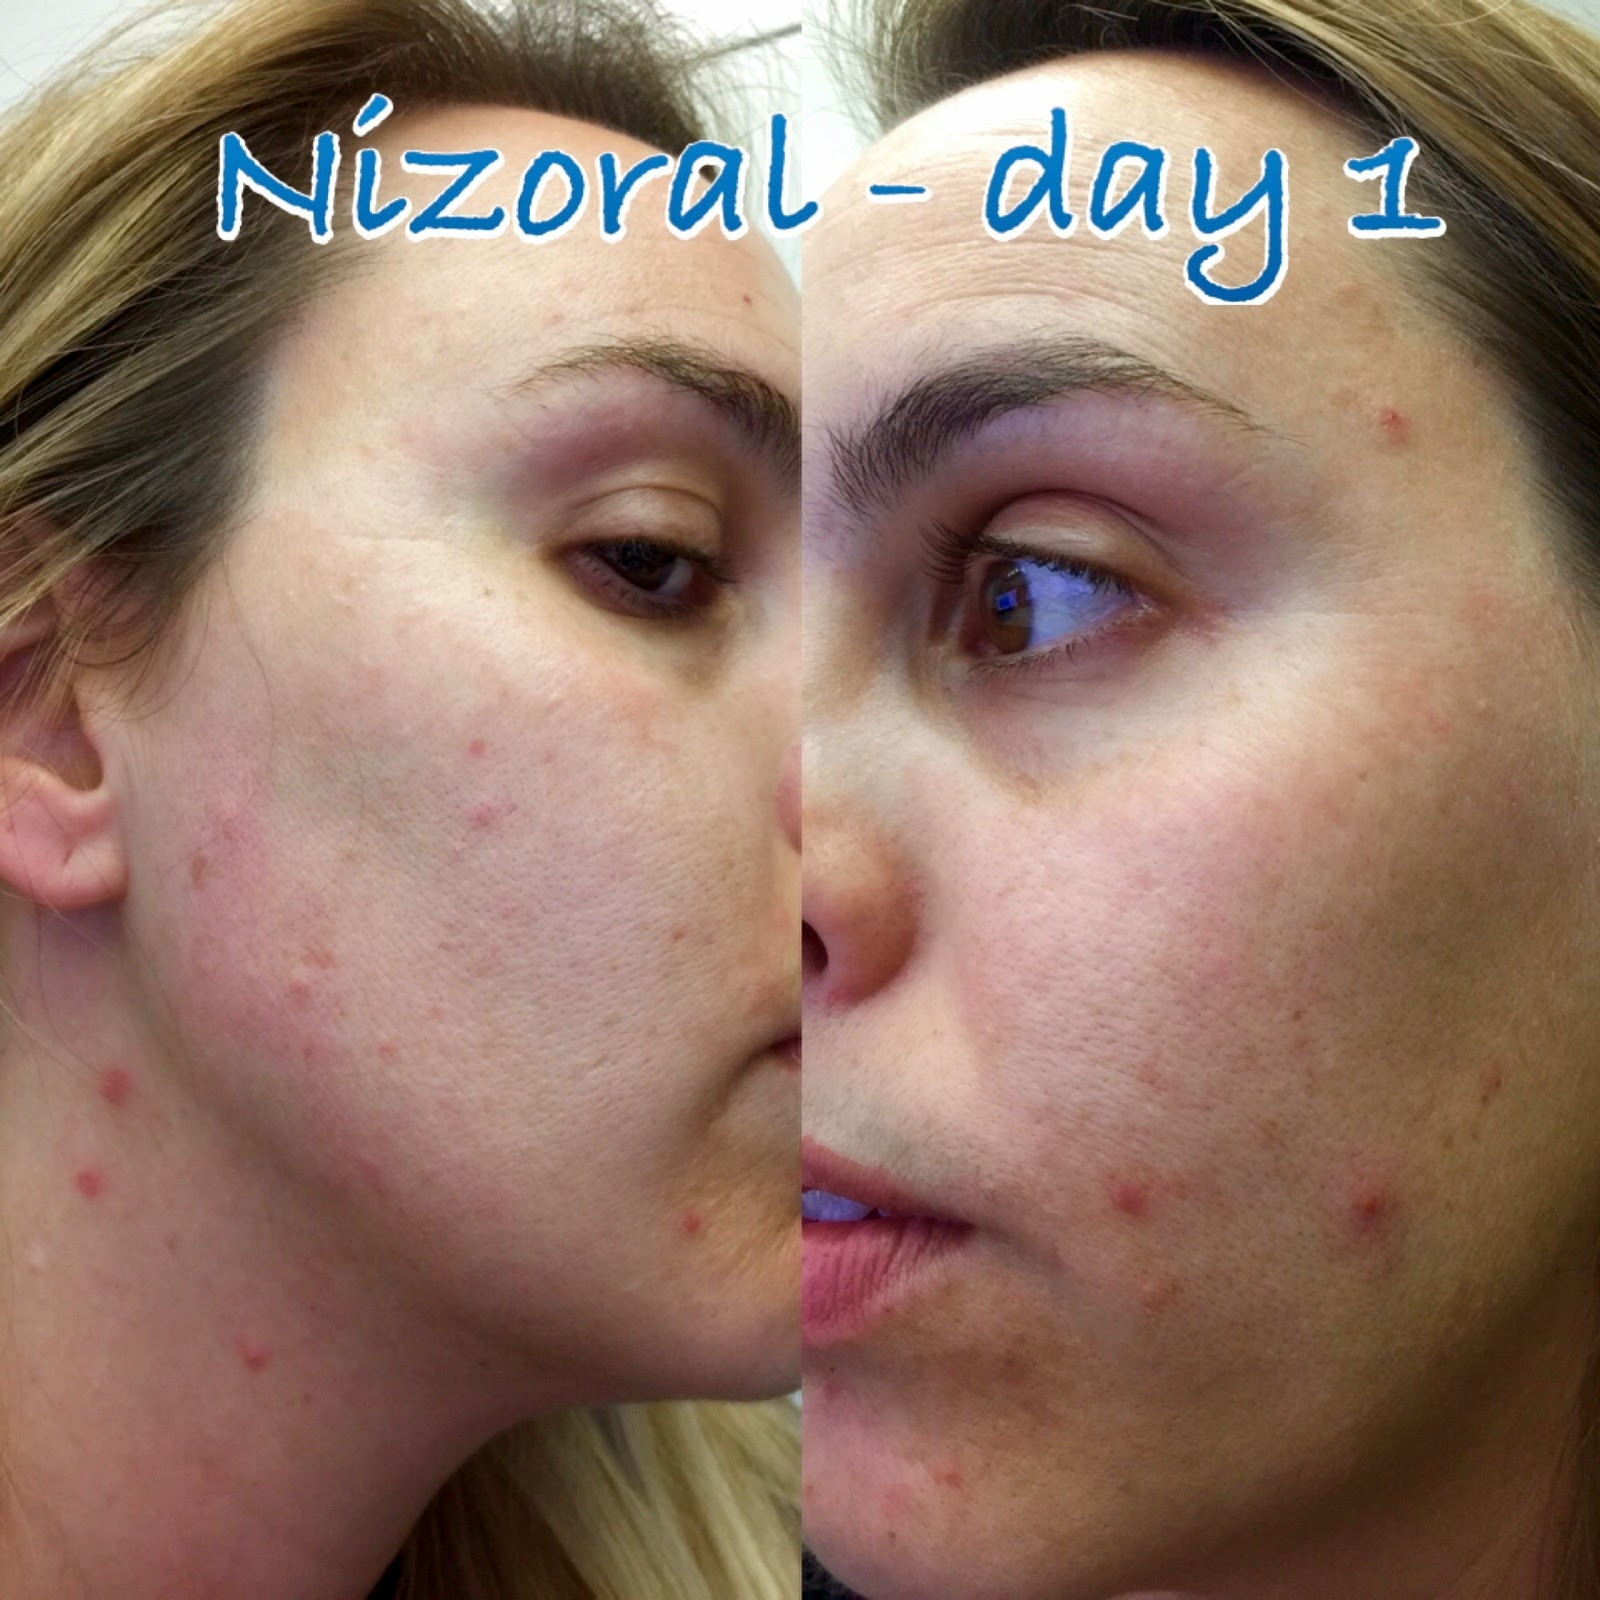 Ketoconazole acne treat